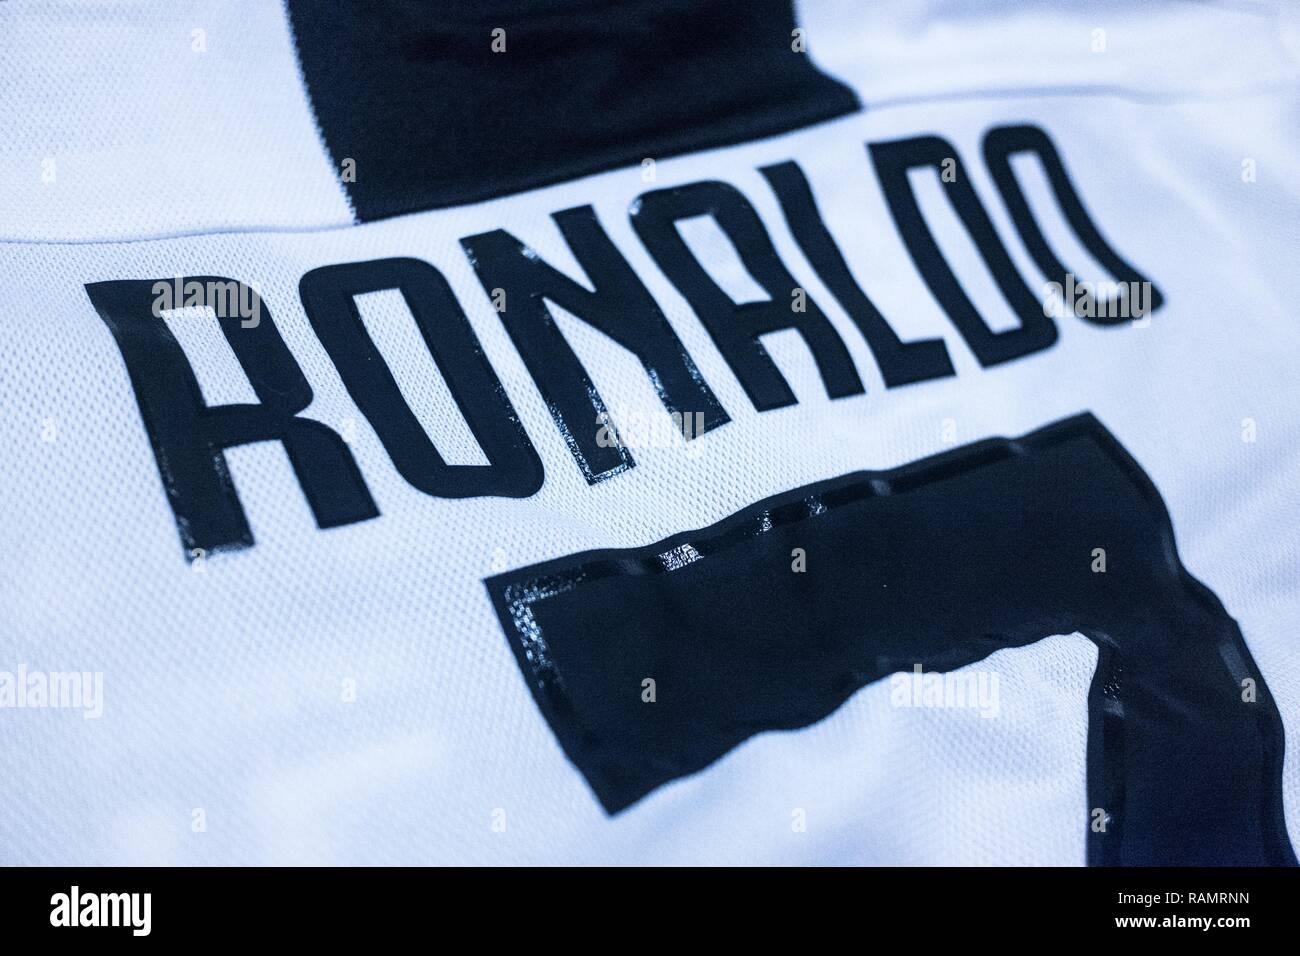 Juventus Logo Stock Photos & Juventus Logo Stock Images - Alamy